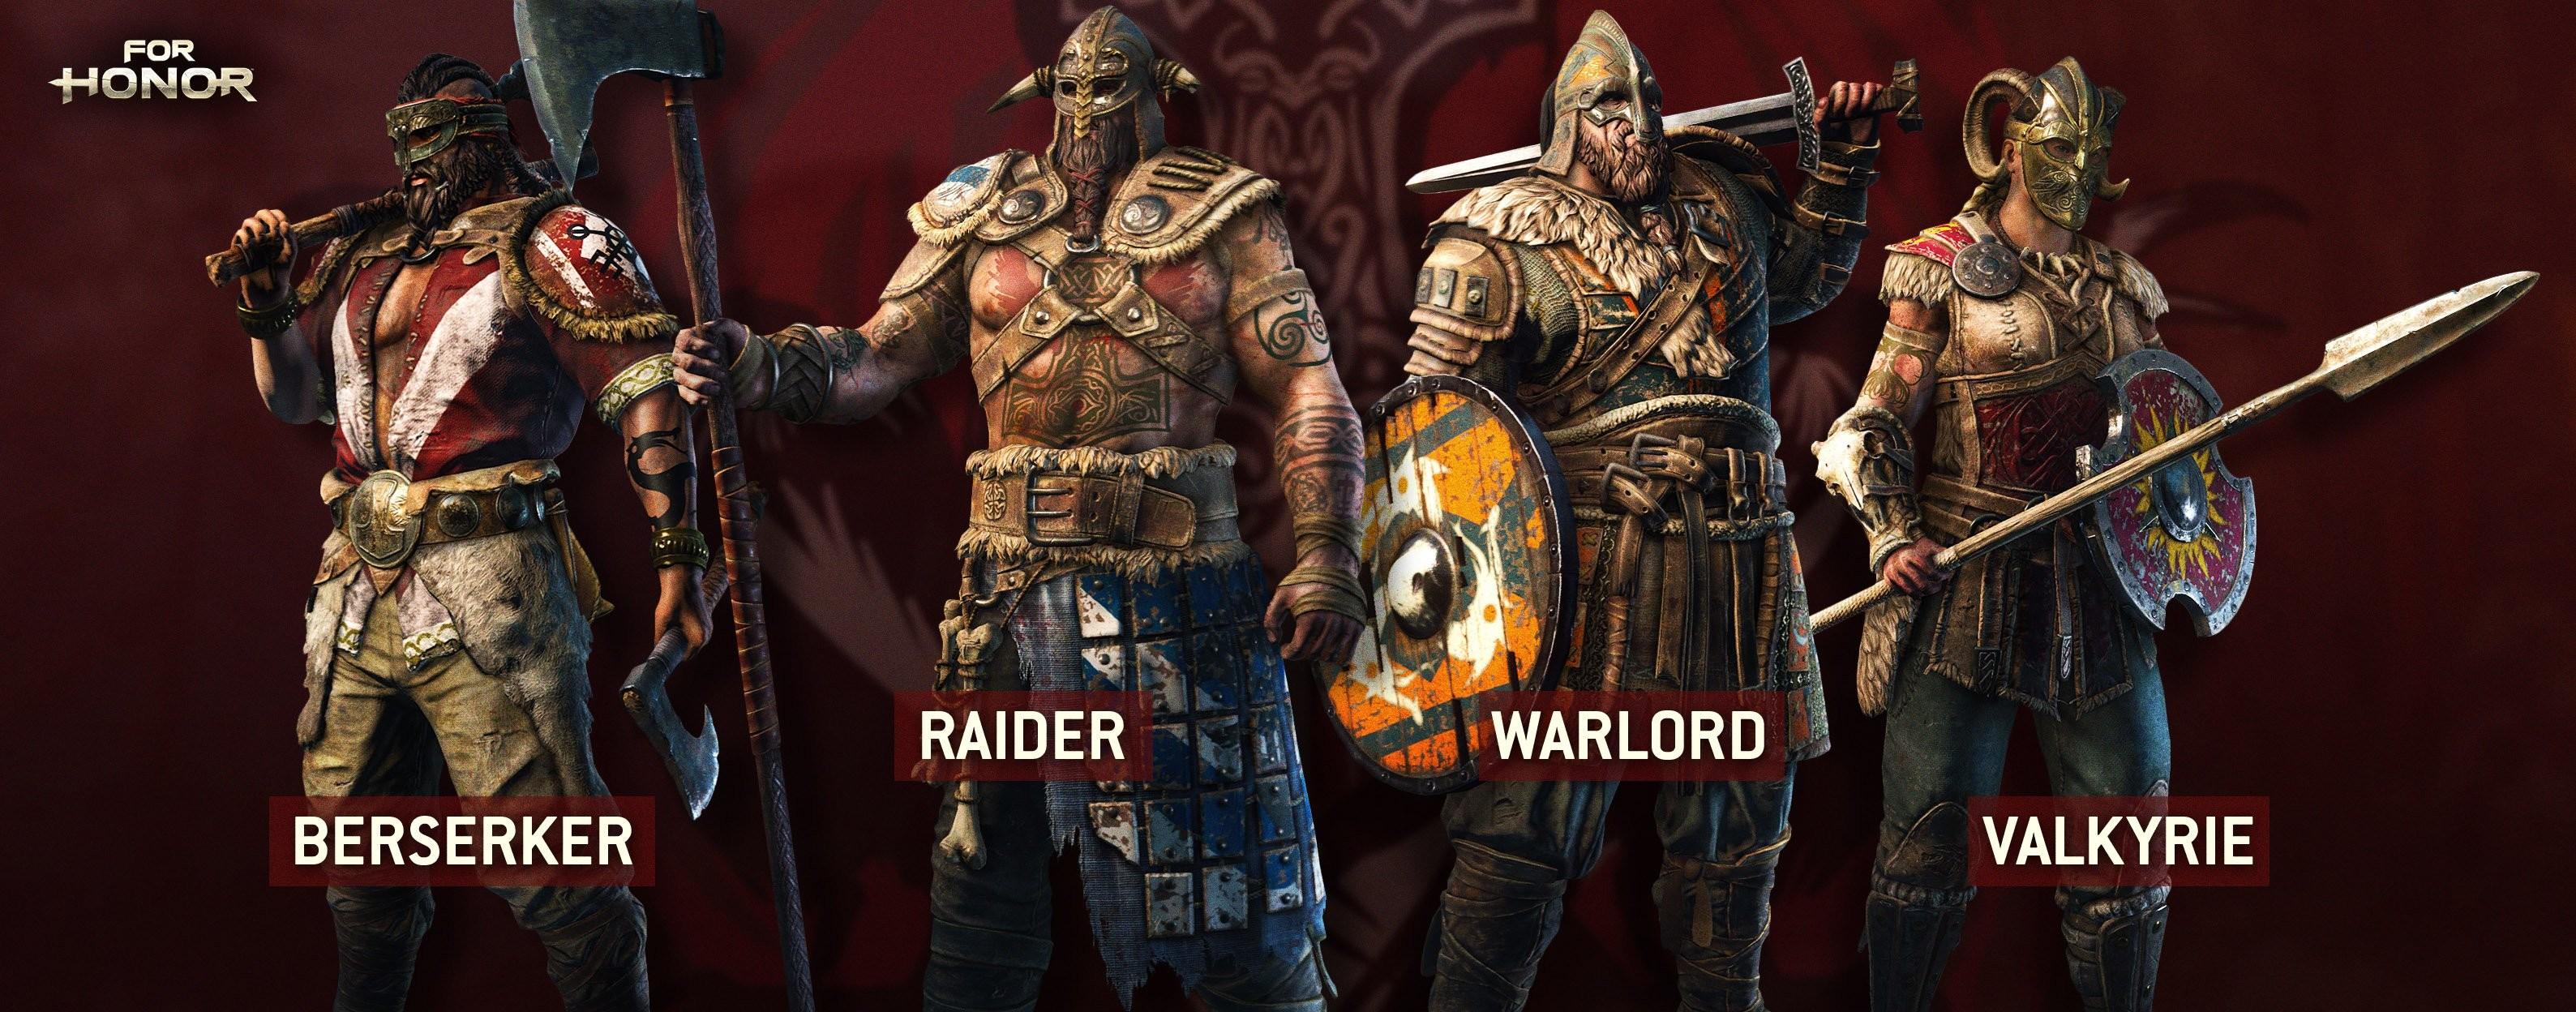 FOR HONOR game video 1fhonor action artwork battle fantasy fighting knight  medieval samurai ubisoft viking warrior wallpaper     1013137    …